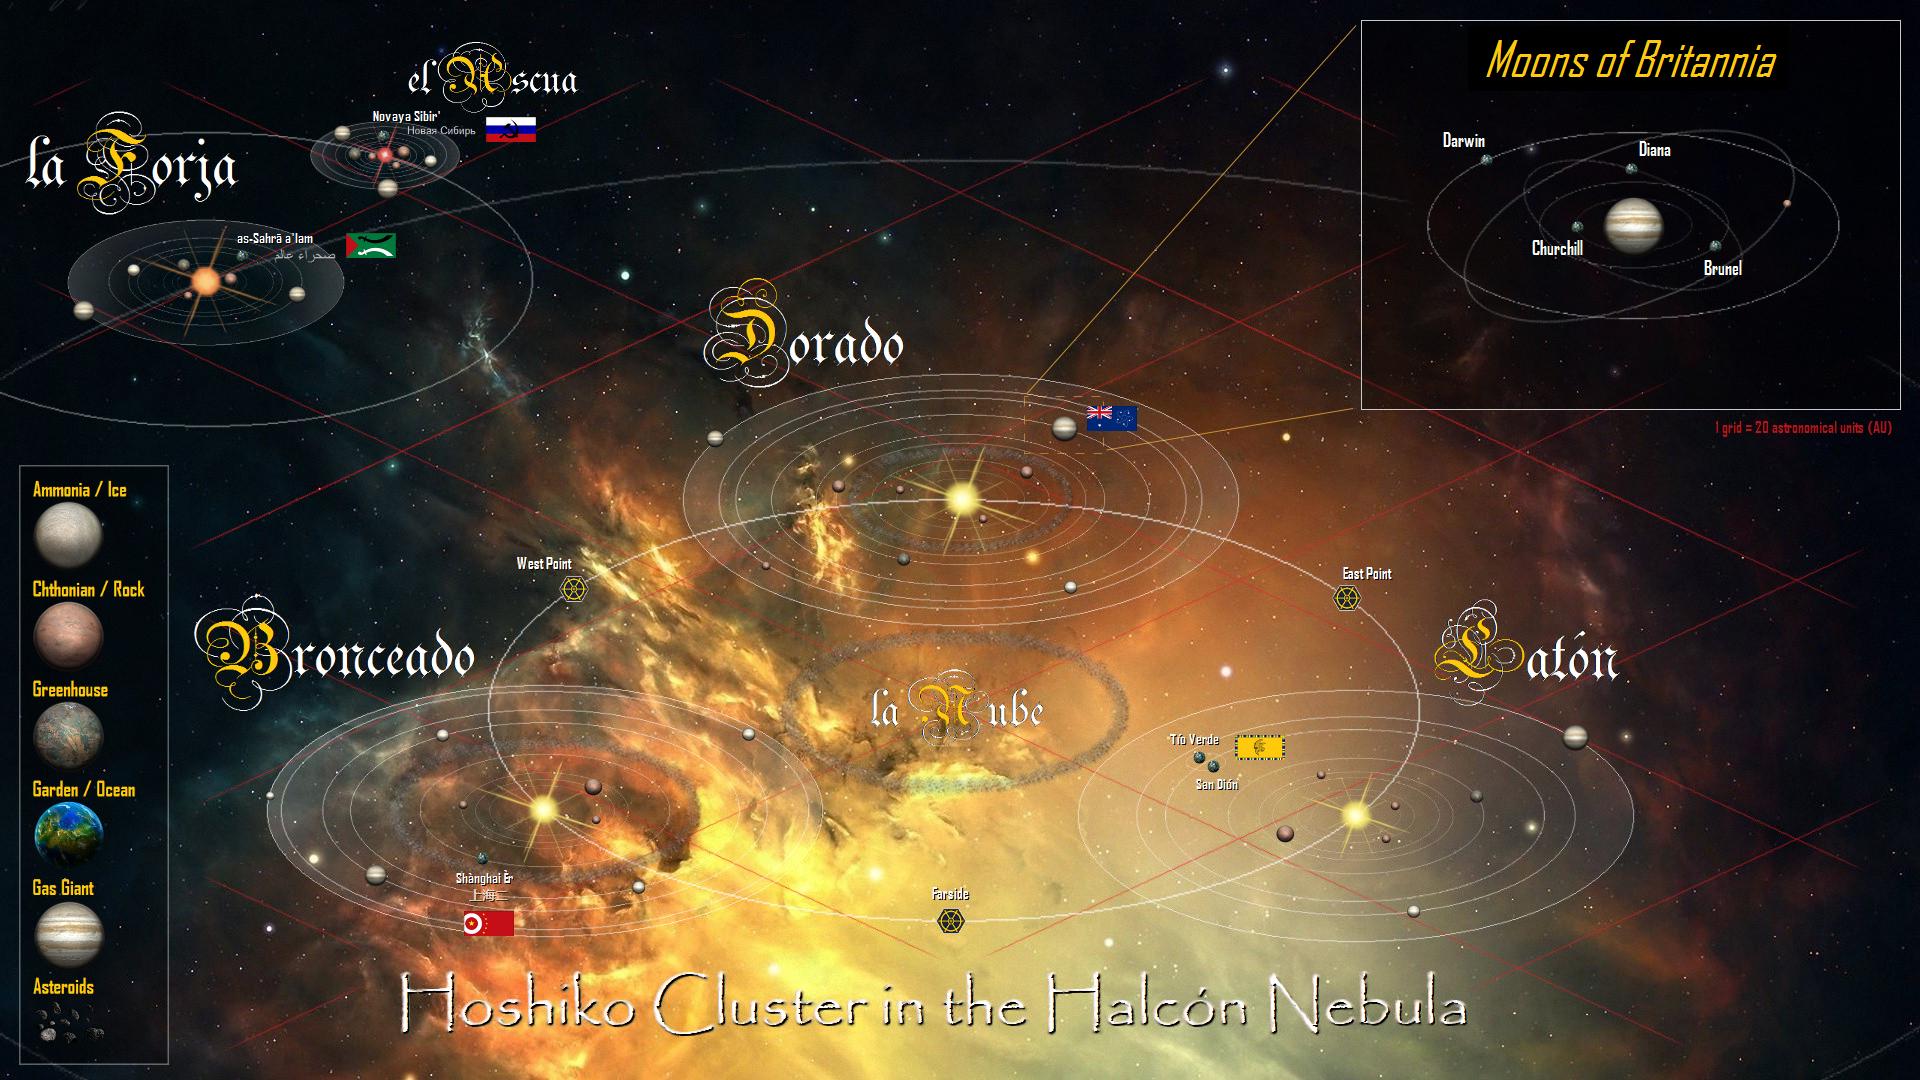 Hoshiko Cluster